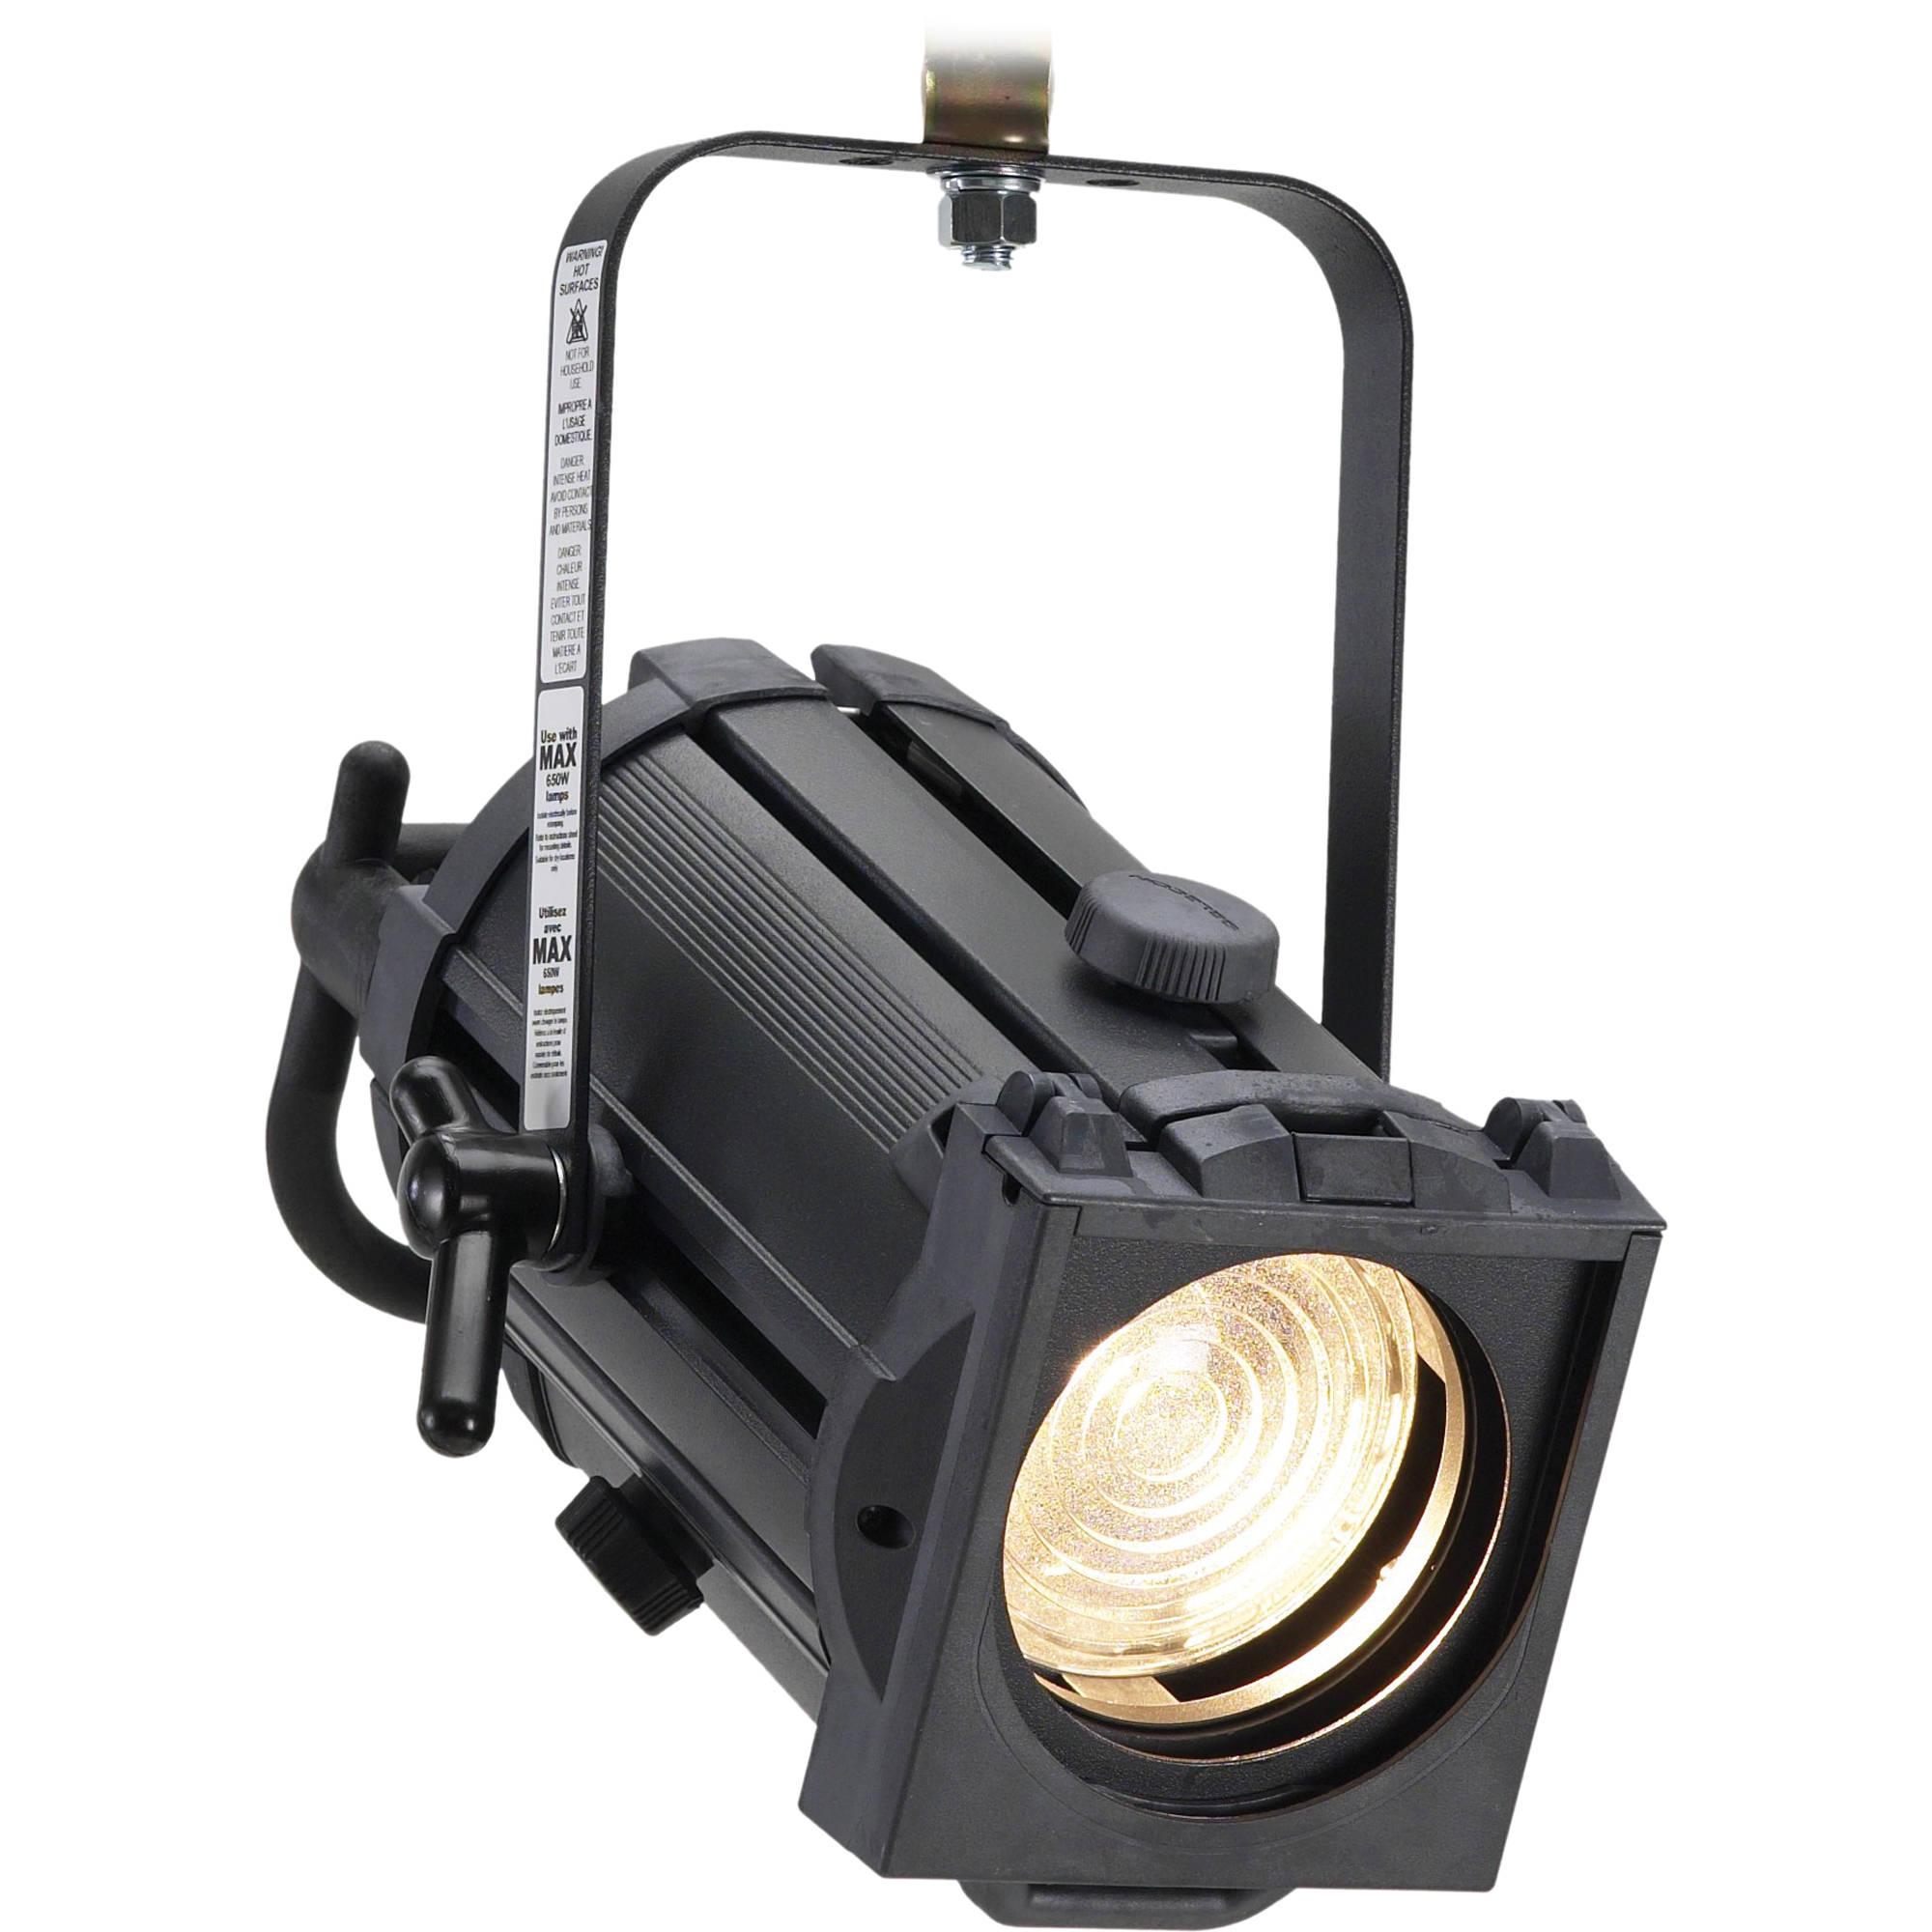 Strand Lighting Acclaim 575W-650W Fresnel Light (Black)  sc 1 st  Bu0026H & Strand Lighting Acclaim 575W-650W Fresnel Light (Black) 12ACFUS